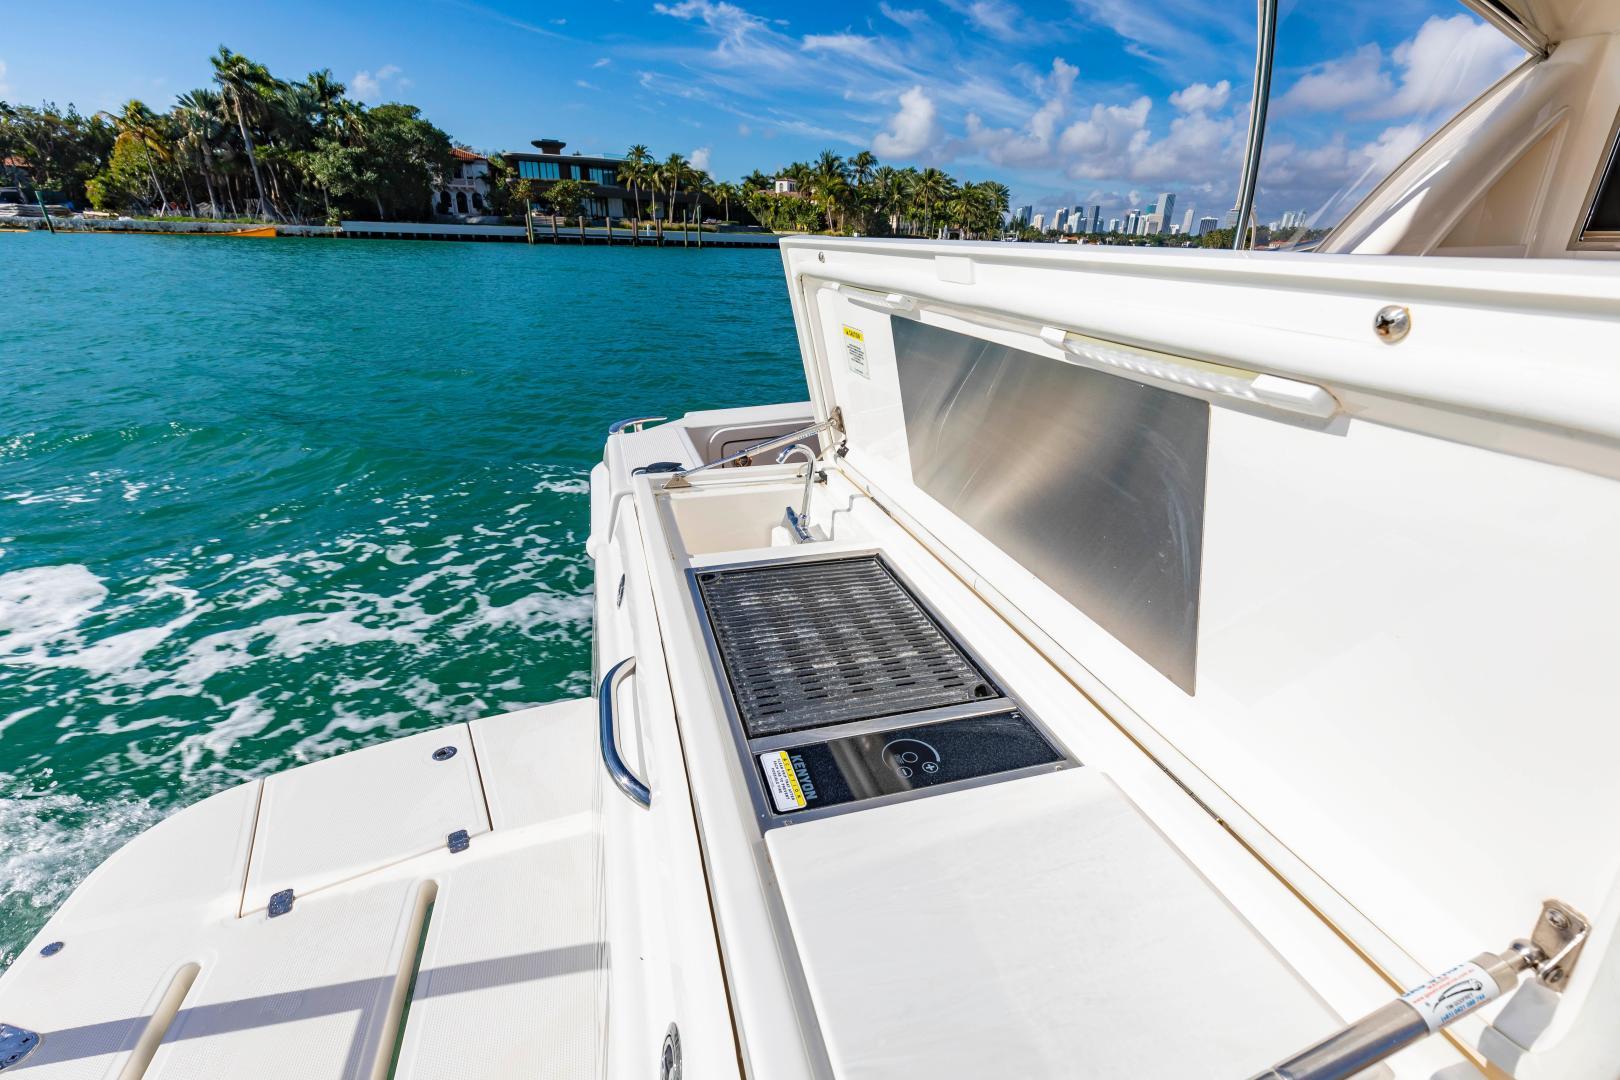 Riviera-395 SUV 2019-Ipanema Miami Beach-Florida-United States-1614895   Thumbnail